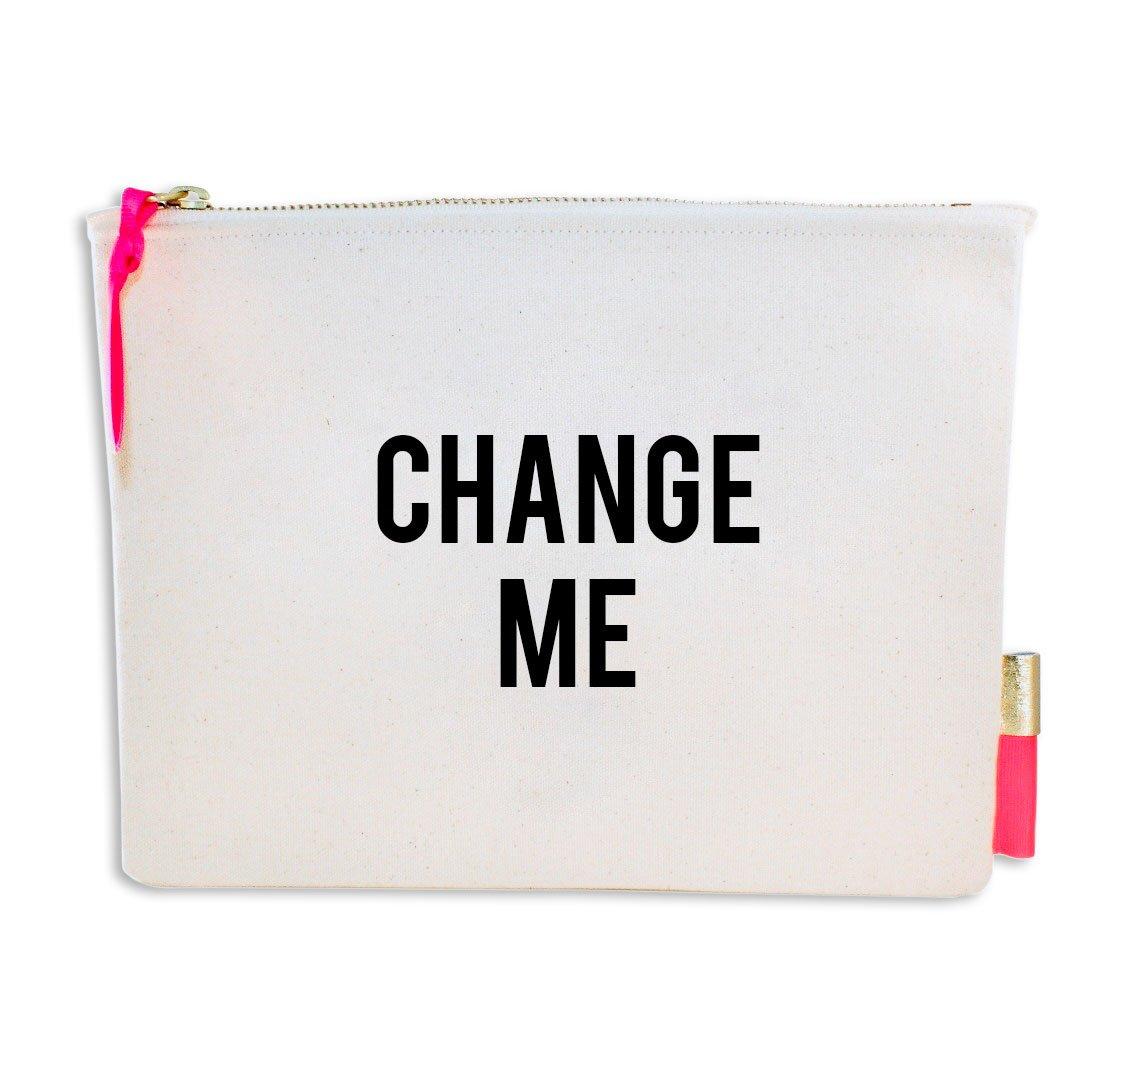 Image of PIPI CUCU CANVAS CLUTCH- CHANGE ME